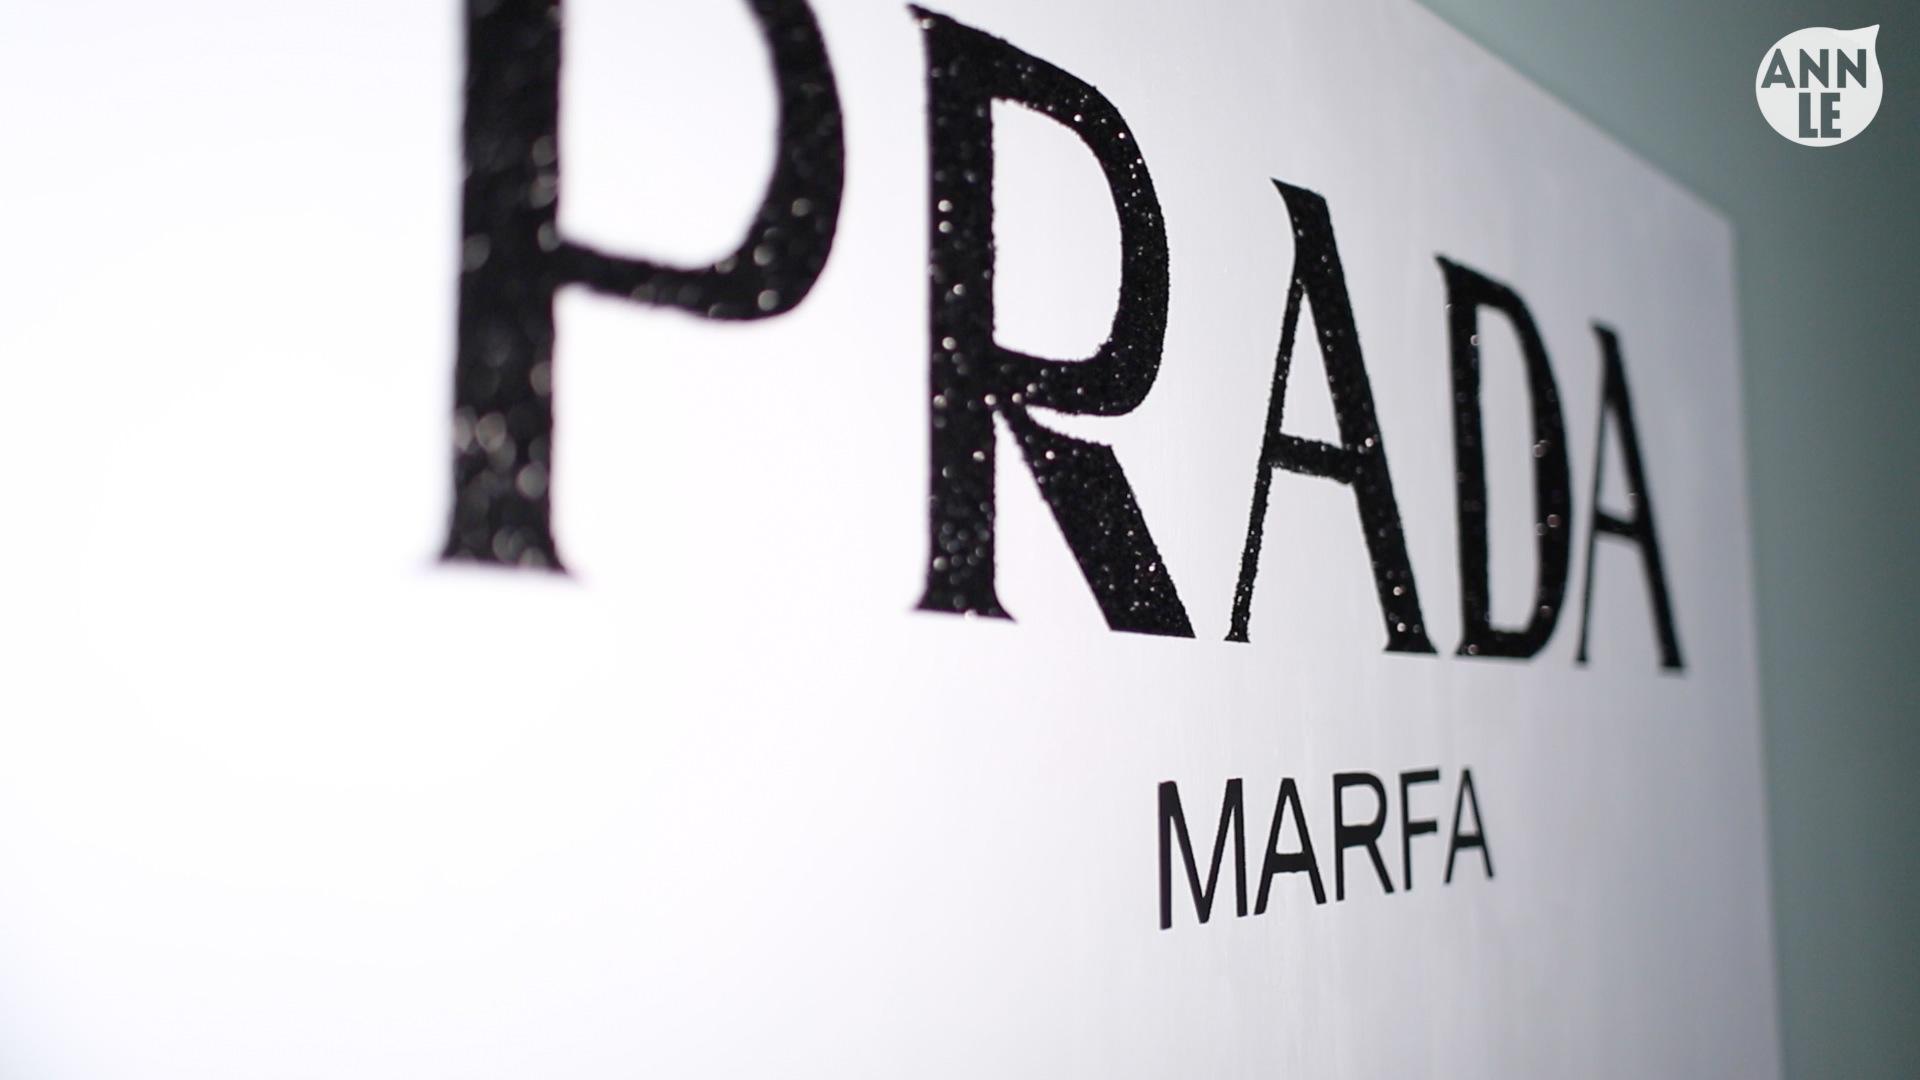 Gossip Girl Prada Wall Art – Ann Le Style Intended For Prada Marfa Wall Art (Image 6 of 20)